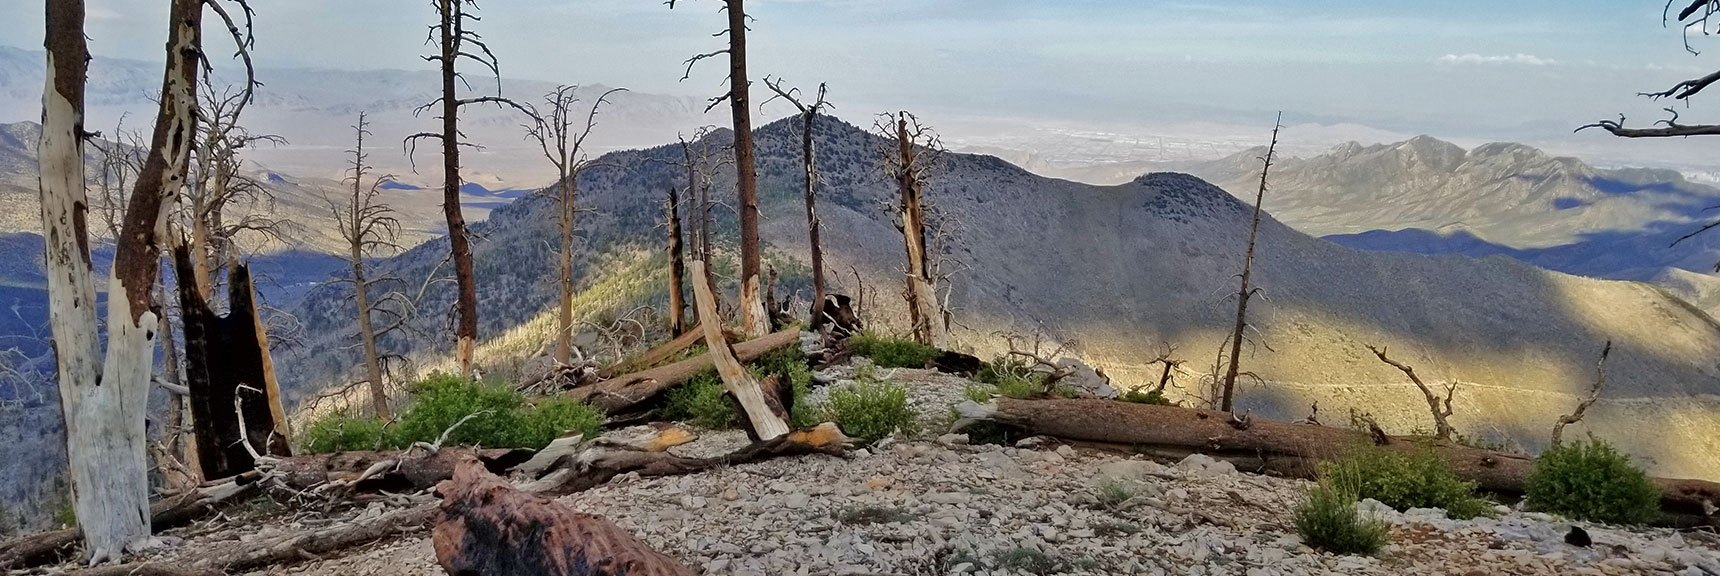 View Down Griffith Peak North Ridge to Harris Mountain | Six Peak Circuit Adventure in the Spring Mountains, Nevada